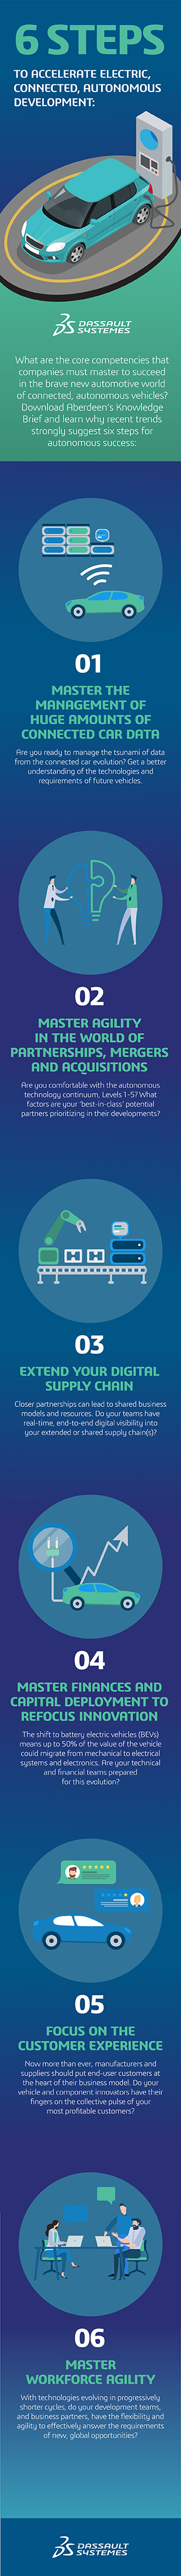 Six Steps To Accelerate Electric Connected, Autonomous Development > Infography>Dassault Systèmes®